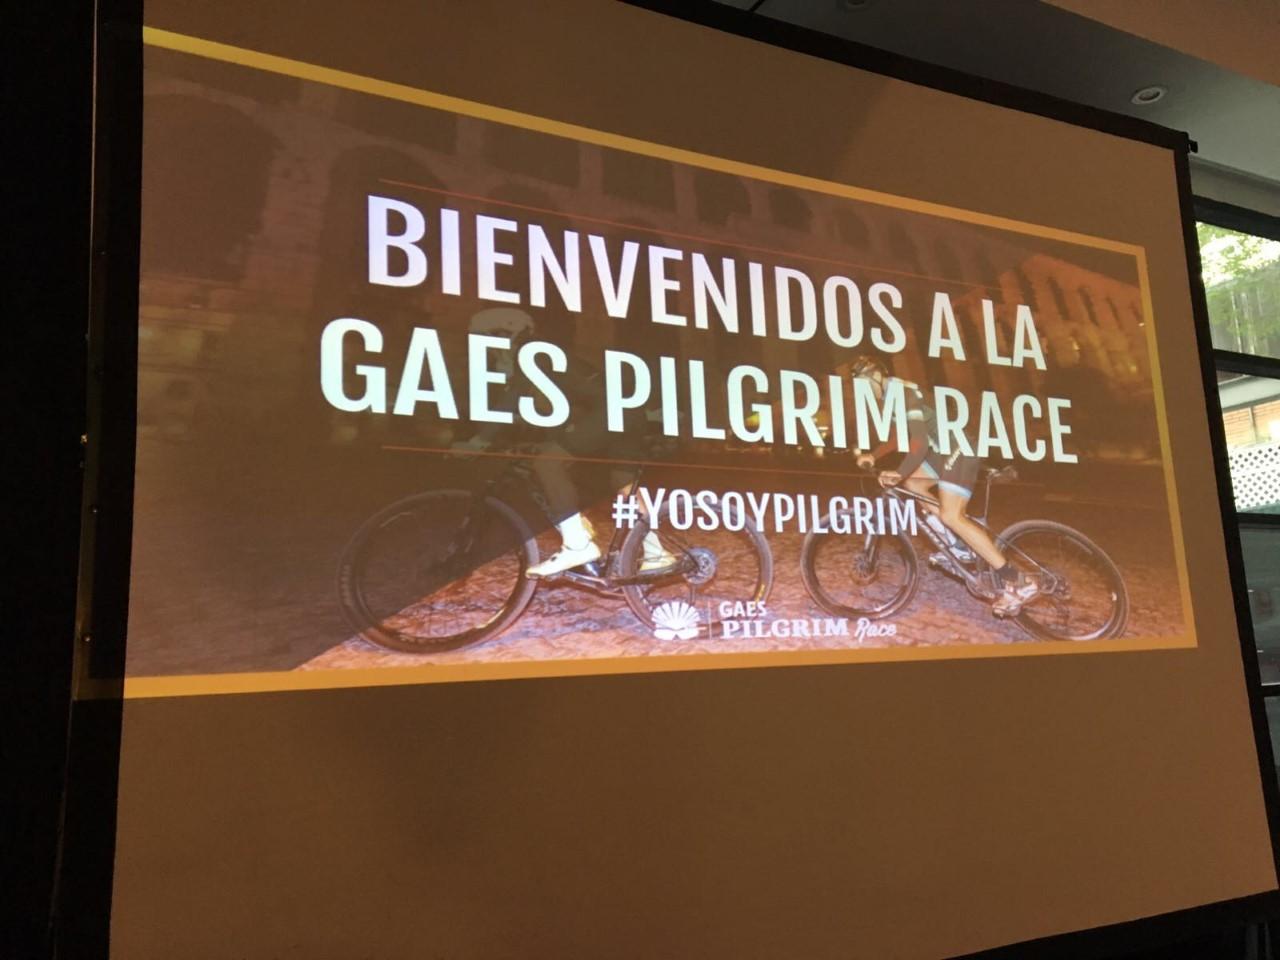 Pilgrim Race